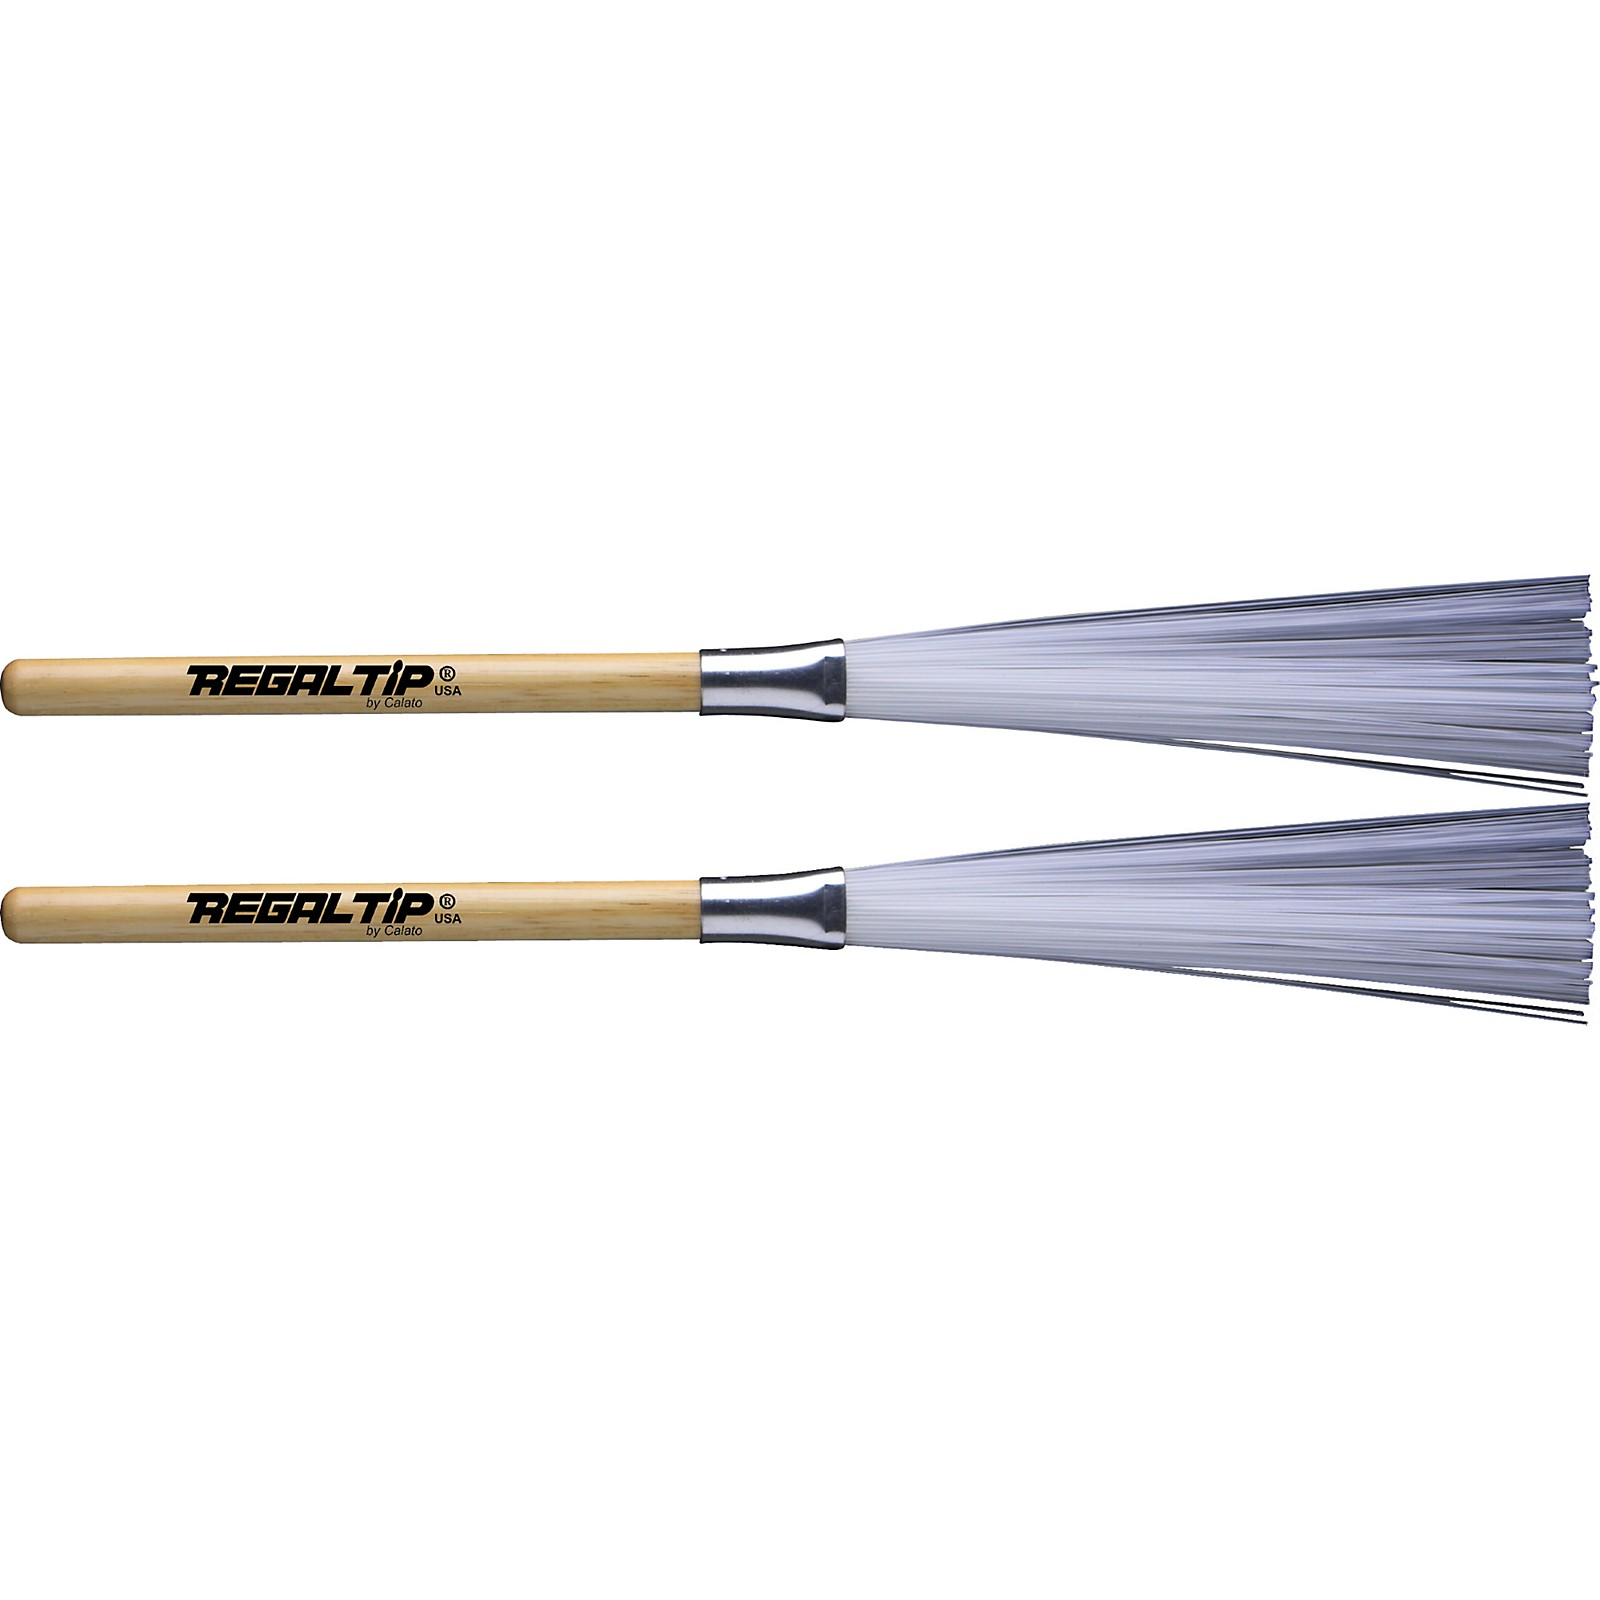 Regal Tip Ultraflex Brushes